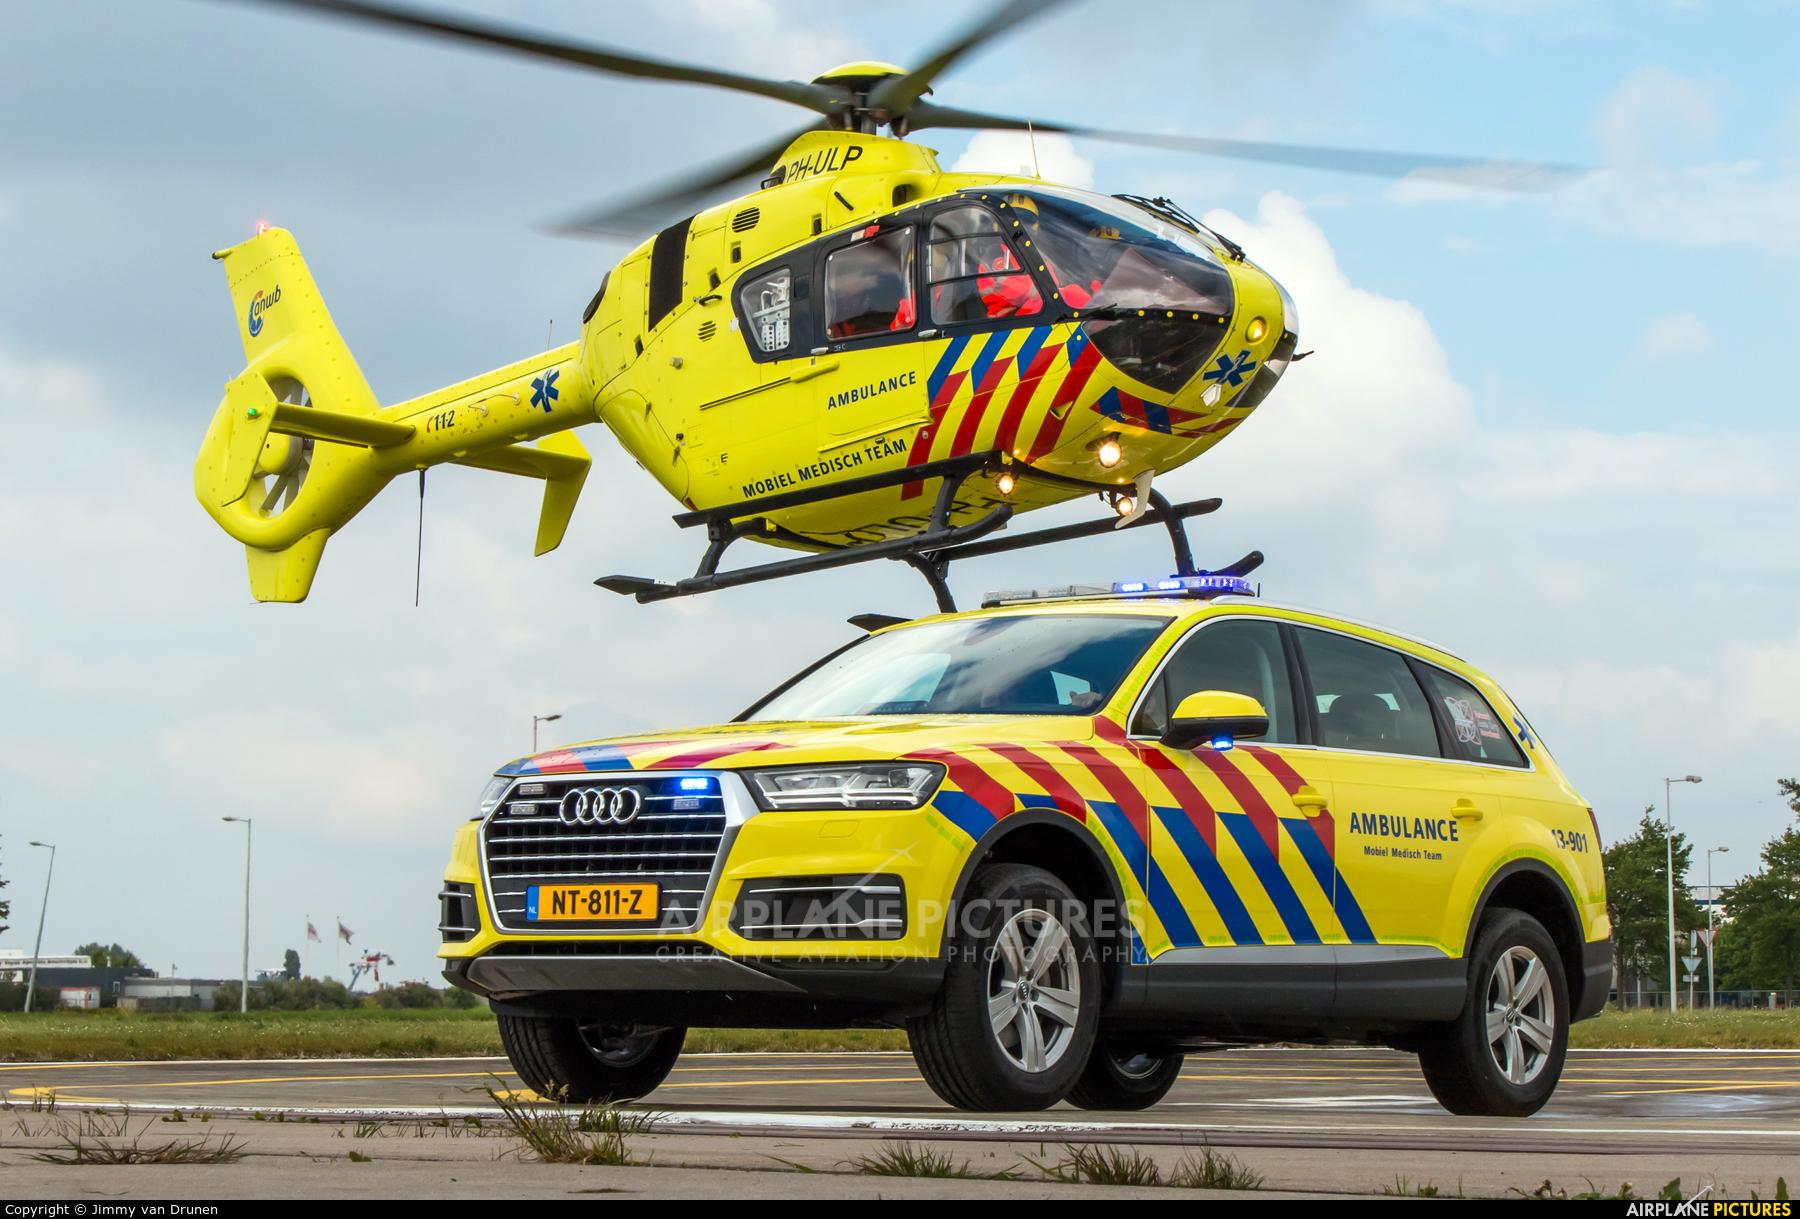 ANWB Medical Air Assistance PH-ULP aircraft at Amsterdam Heliport